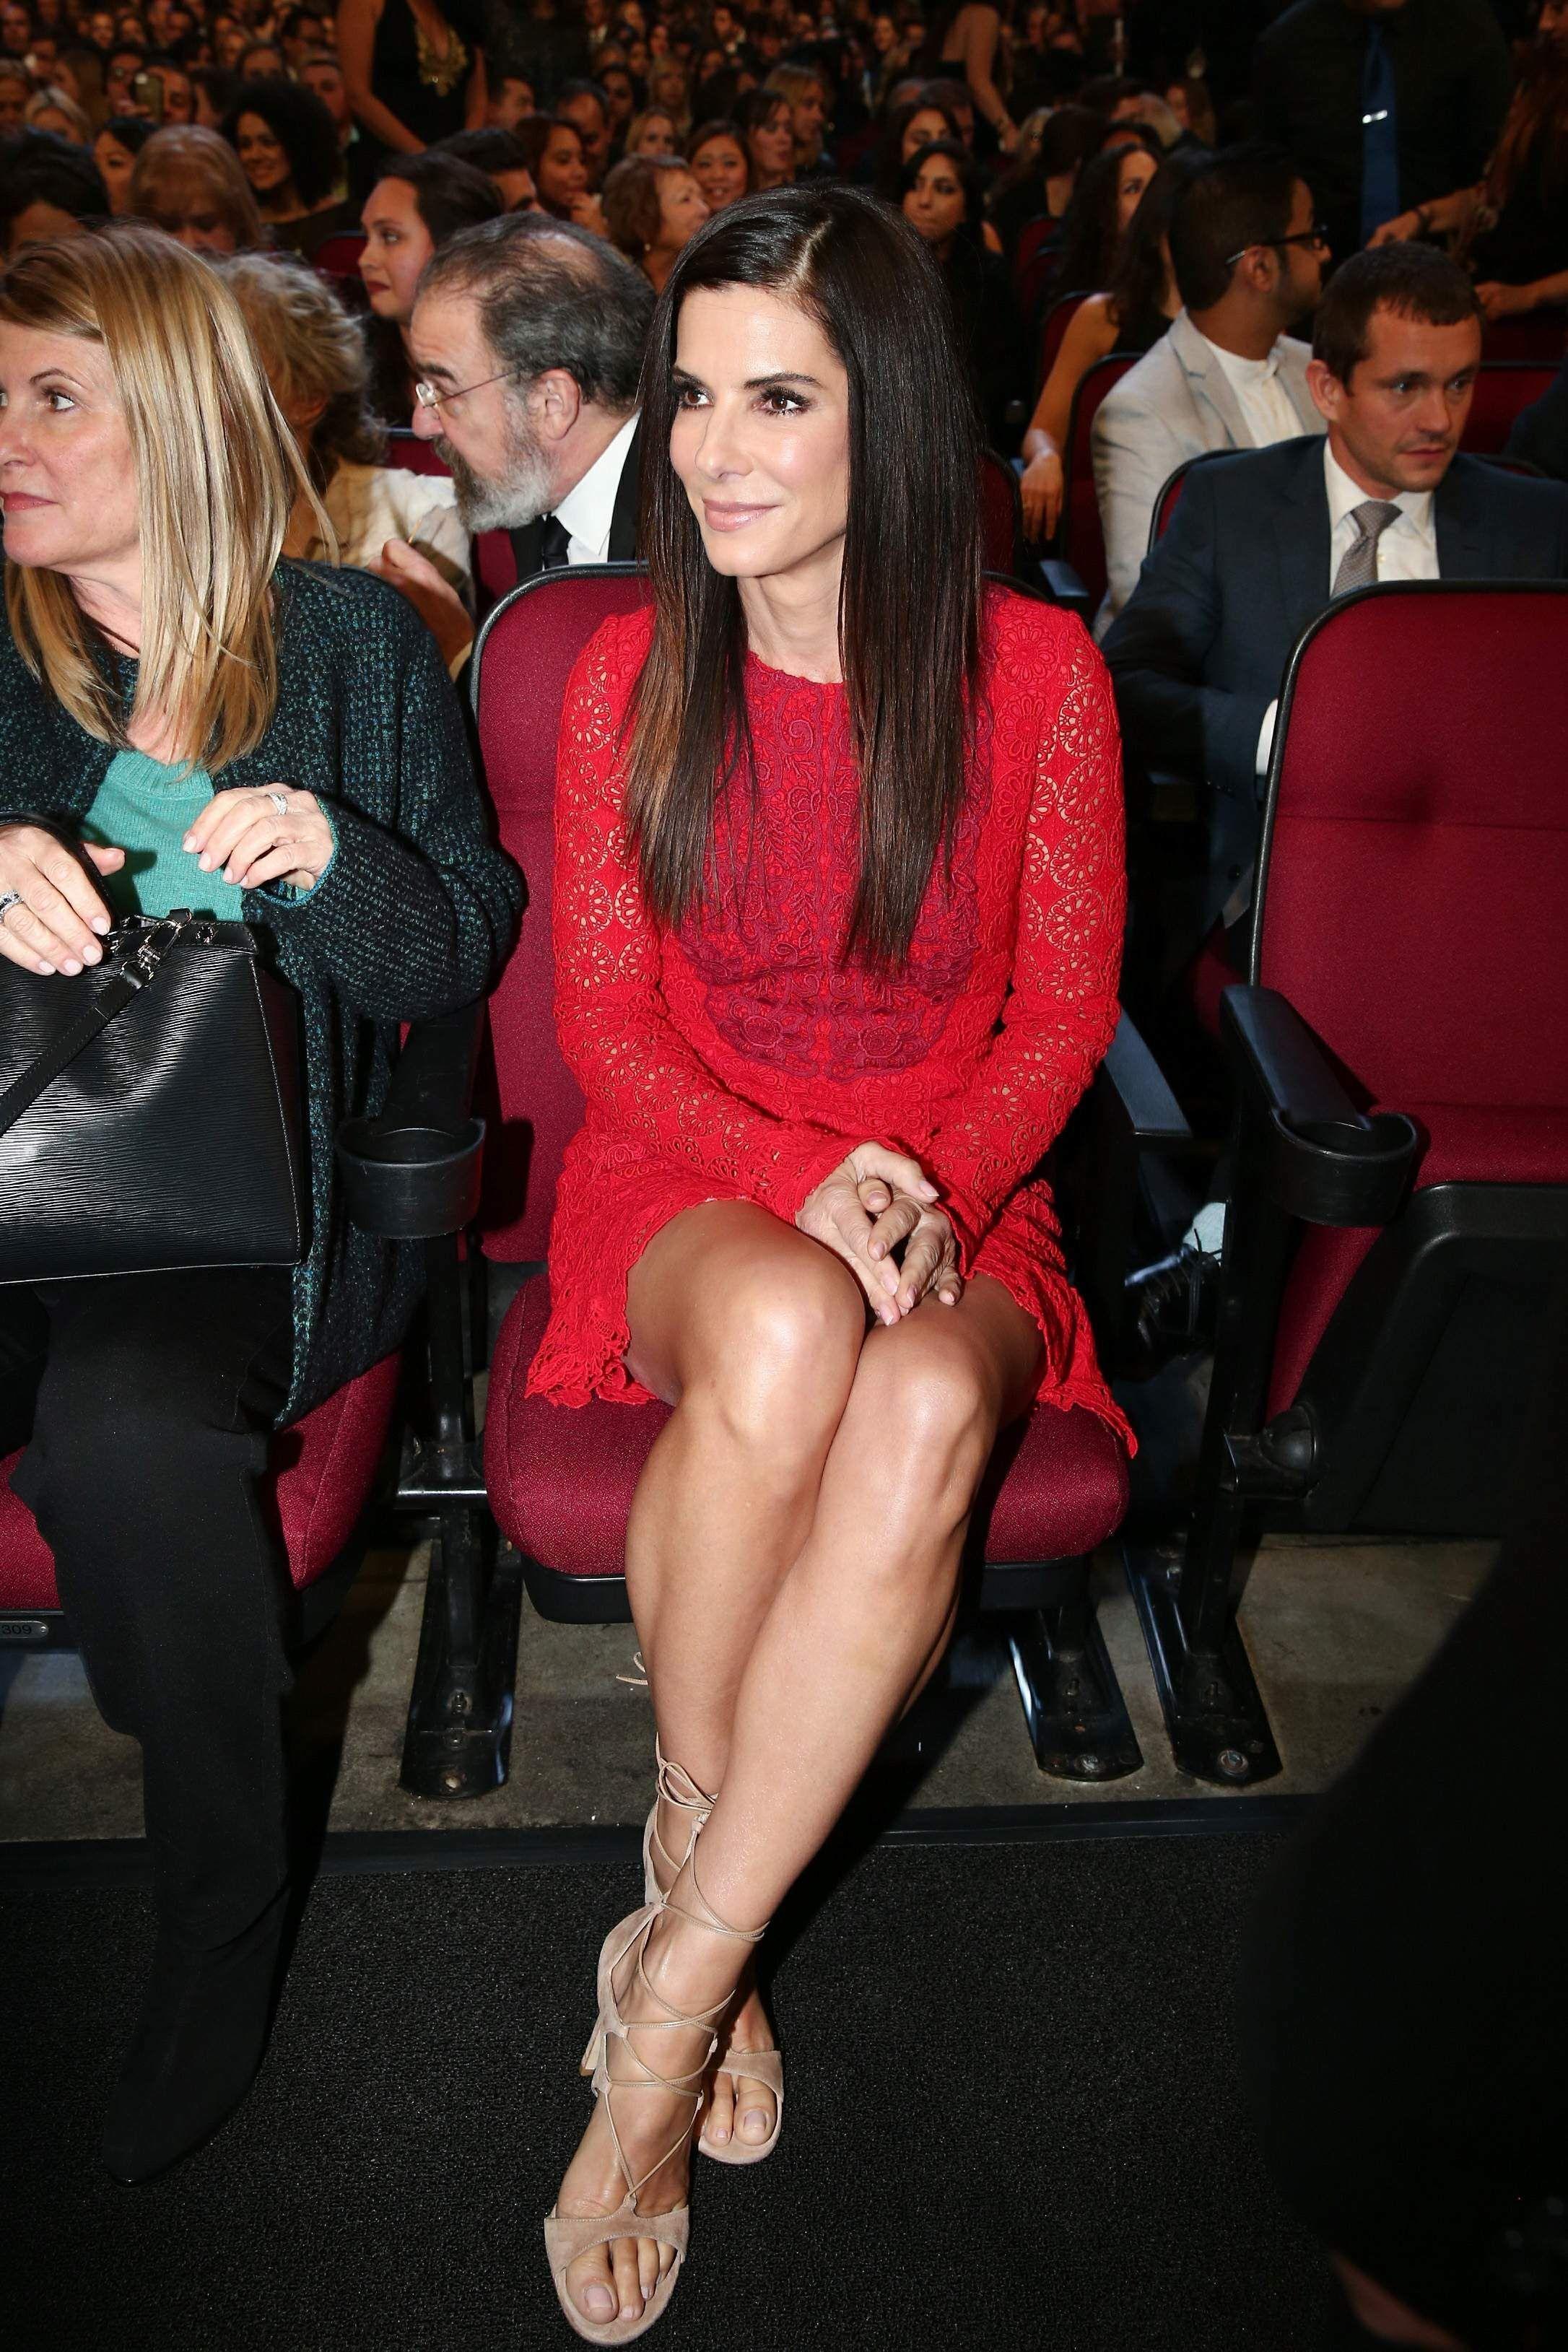 Sandra S Closet: Sandra Bullock's Feet